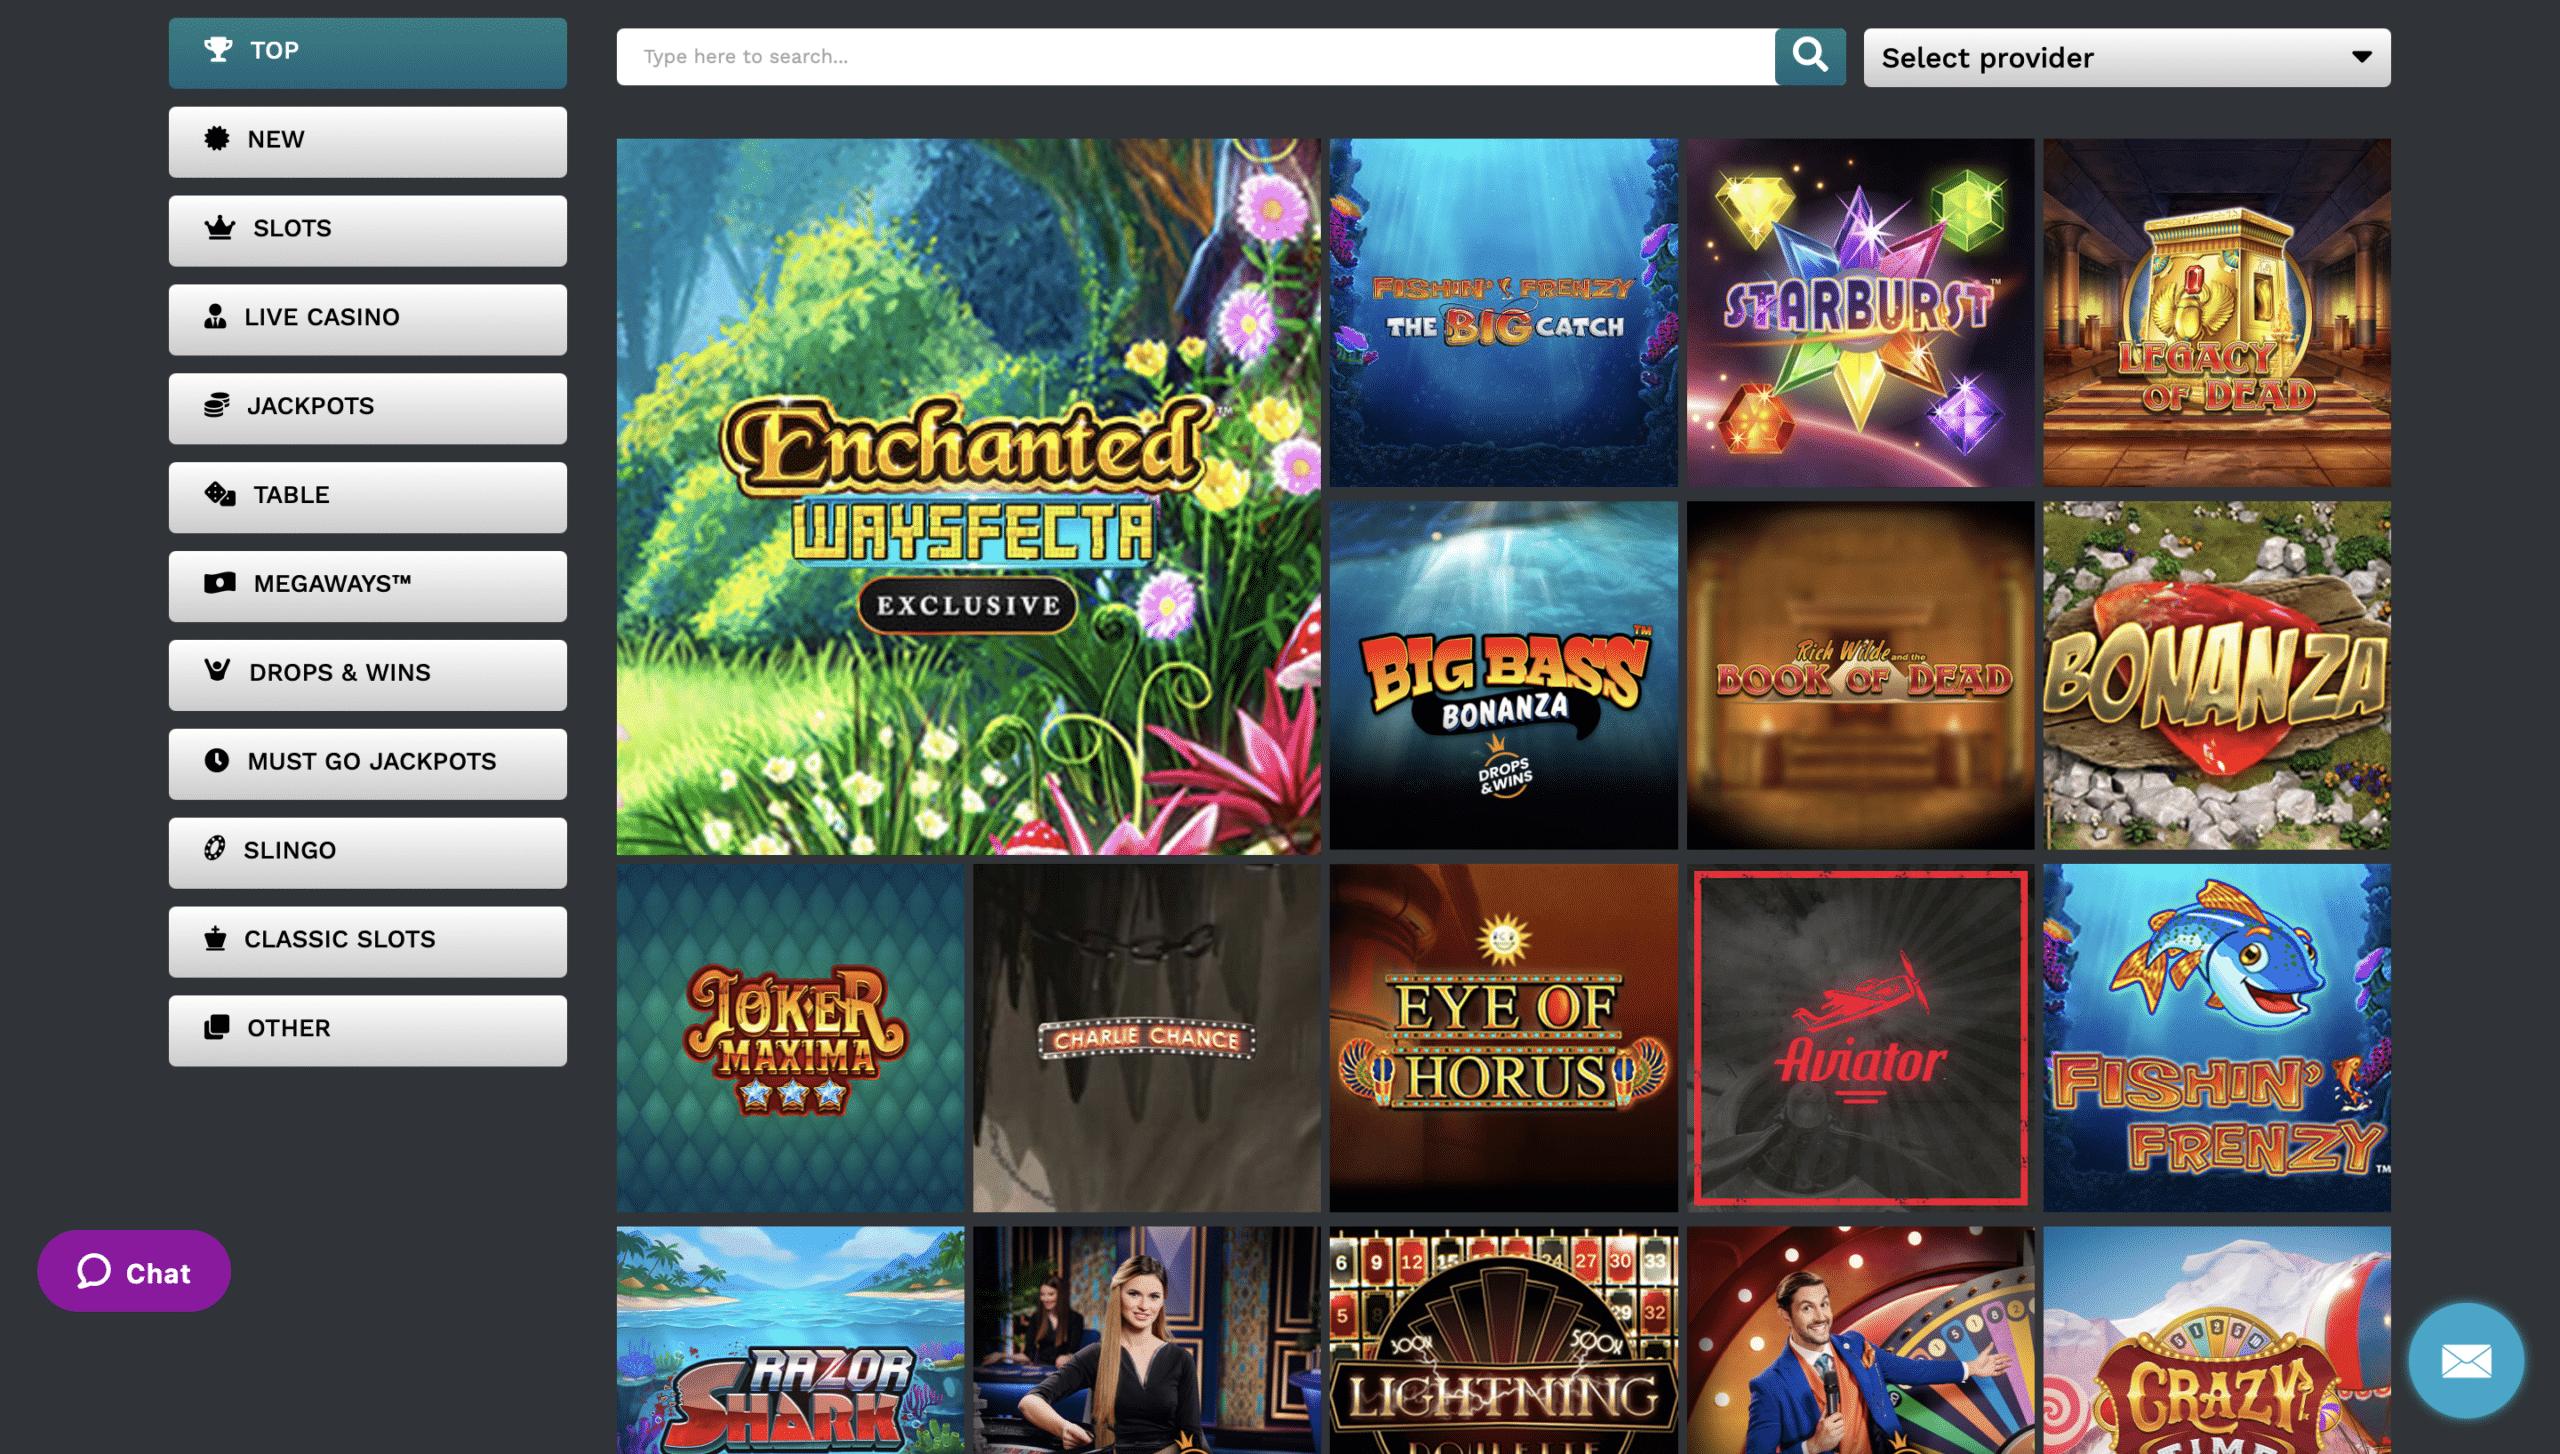 21Prive Casino Game Selection